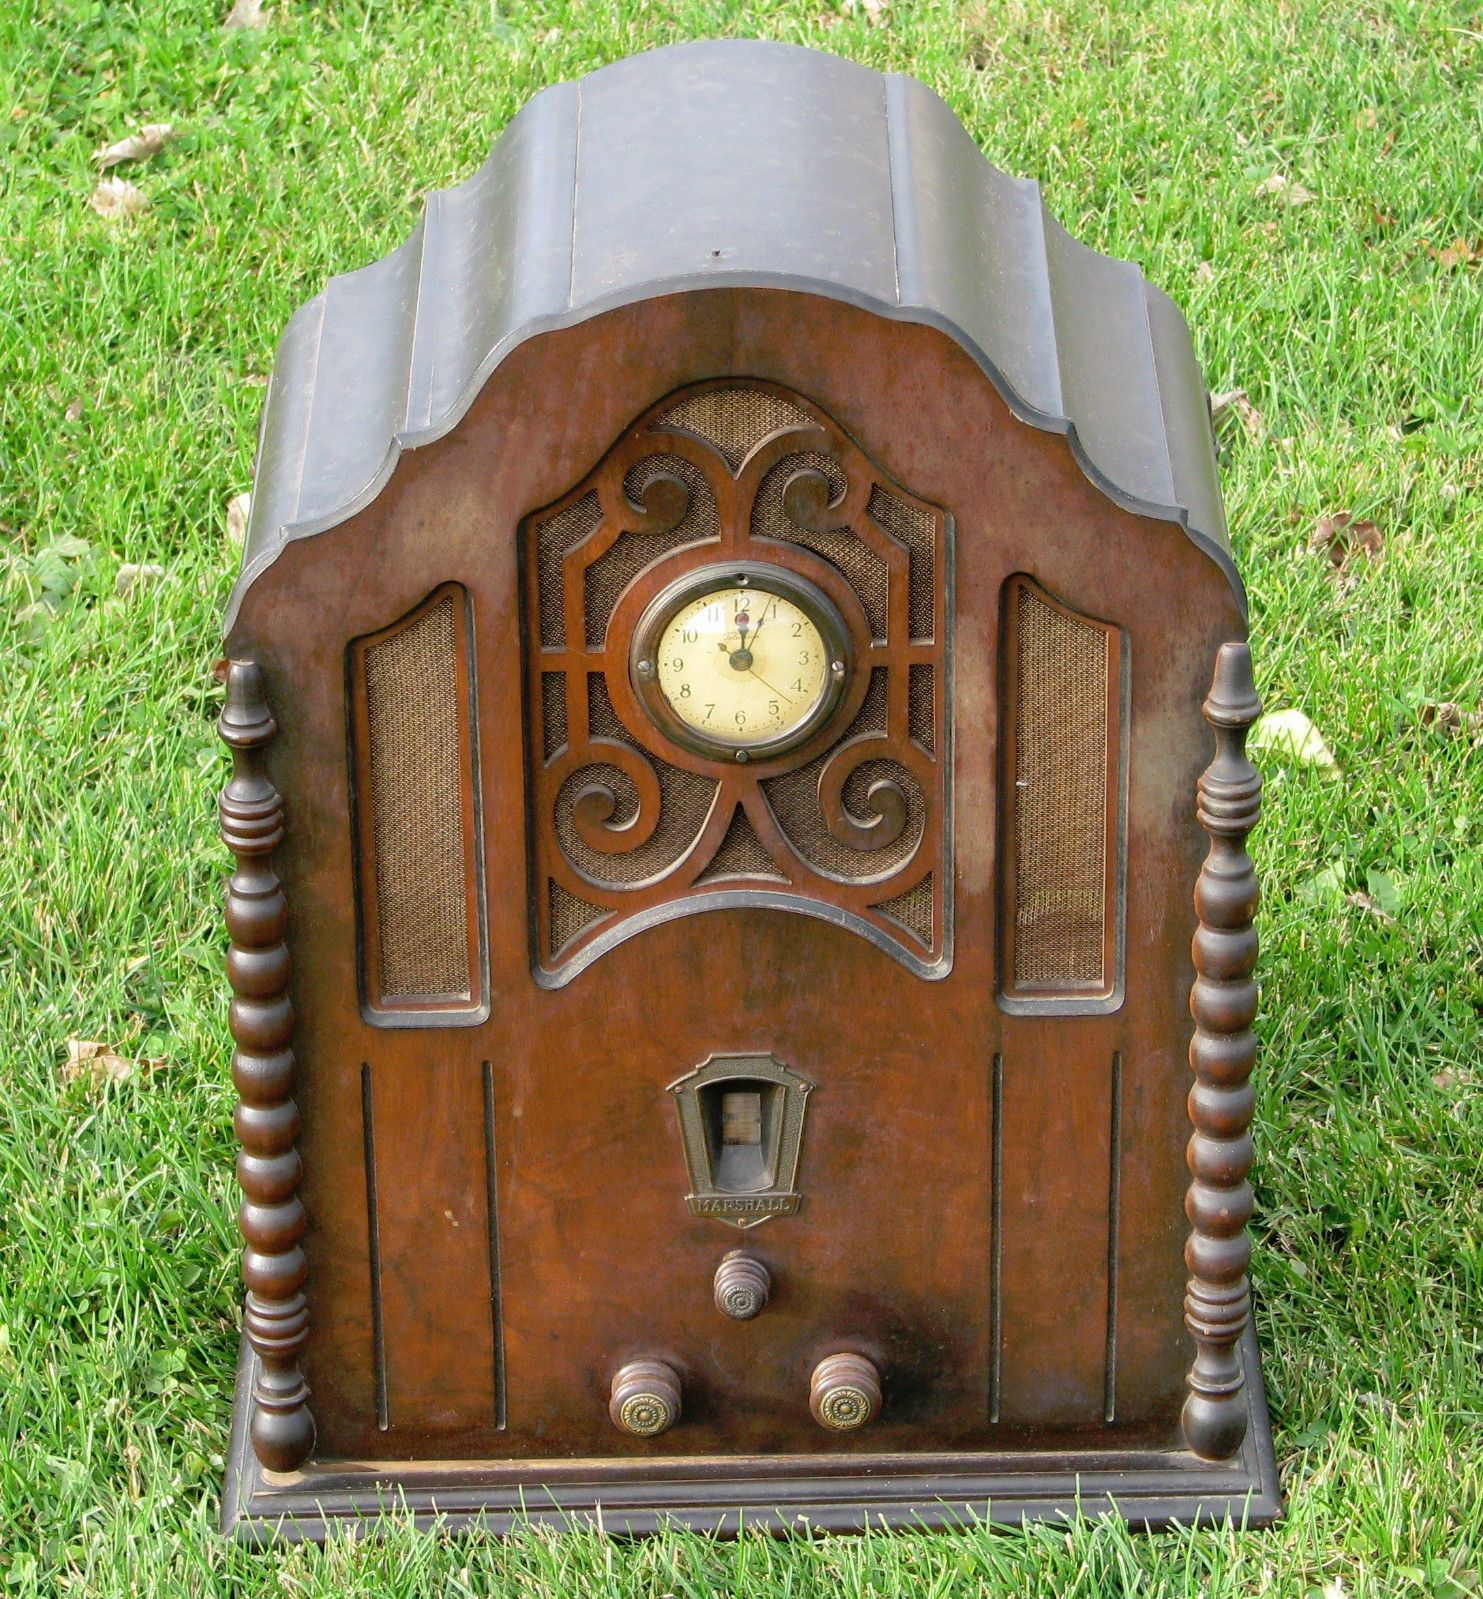 Vintage Art Deco Marshall Cathedral Tube Radio With Telechron Clock Ebay Antique Radio Vintage Radio Antique Wall Clock